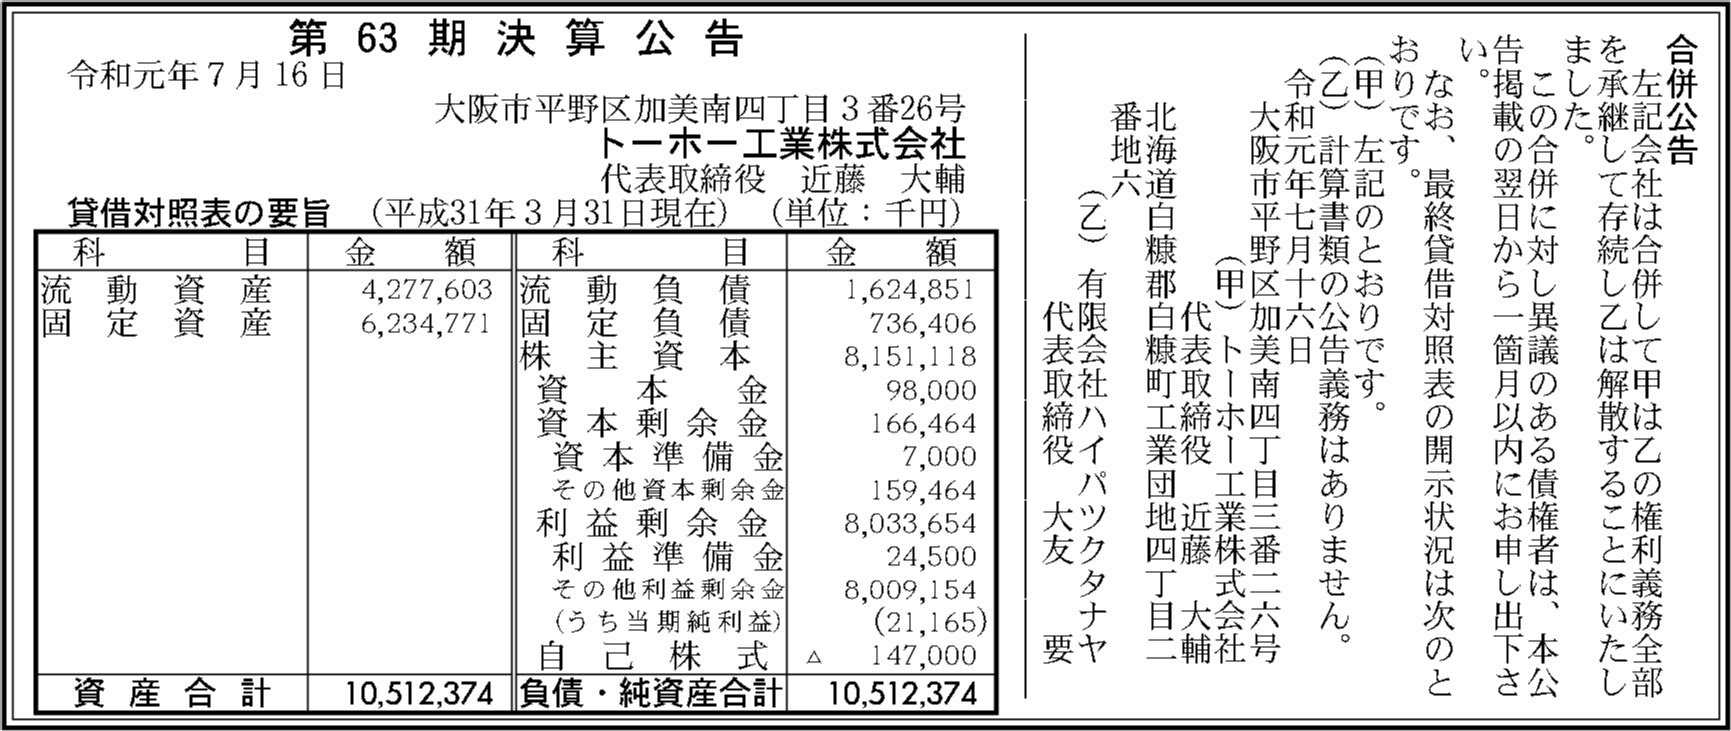 0124 a9da60983c568a890761e6f5f9e42dec9aa7d6dd3abab18a3e89c36575db4680d7ac062cfc1e75ece17b07b75894dda691e8f9d1d9941c824a30628bb8475c04 01